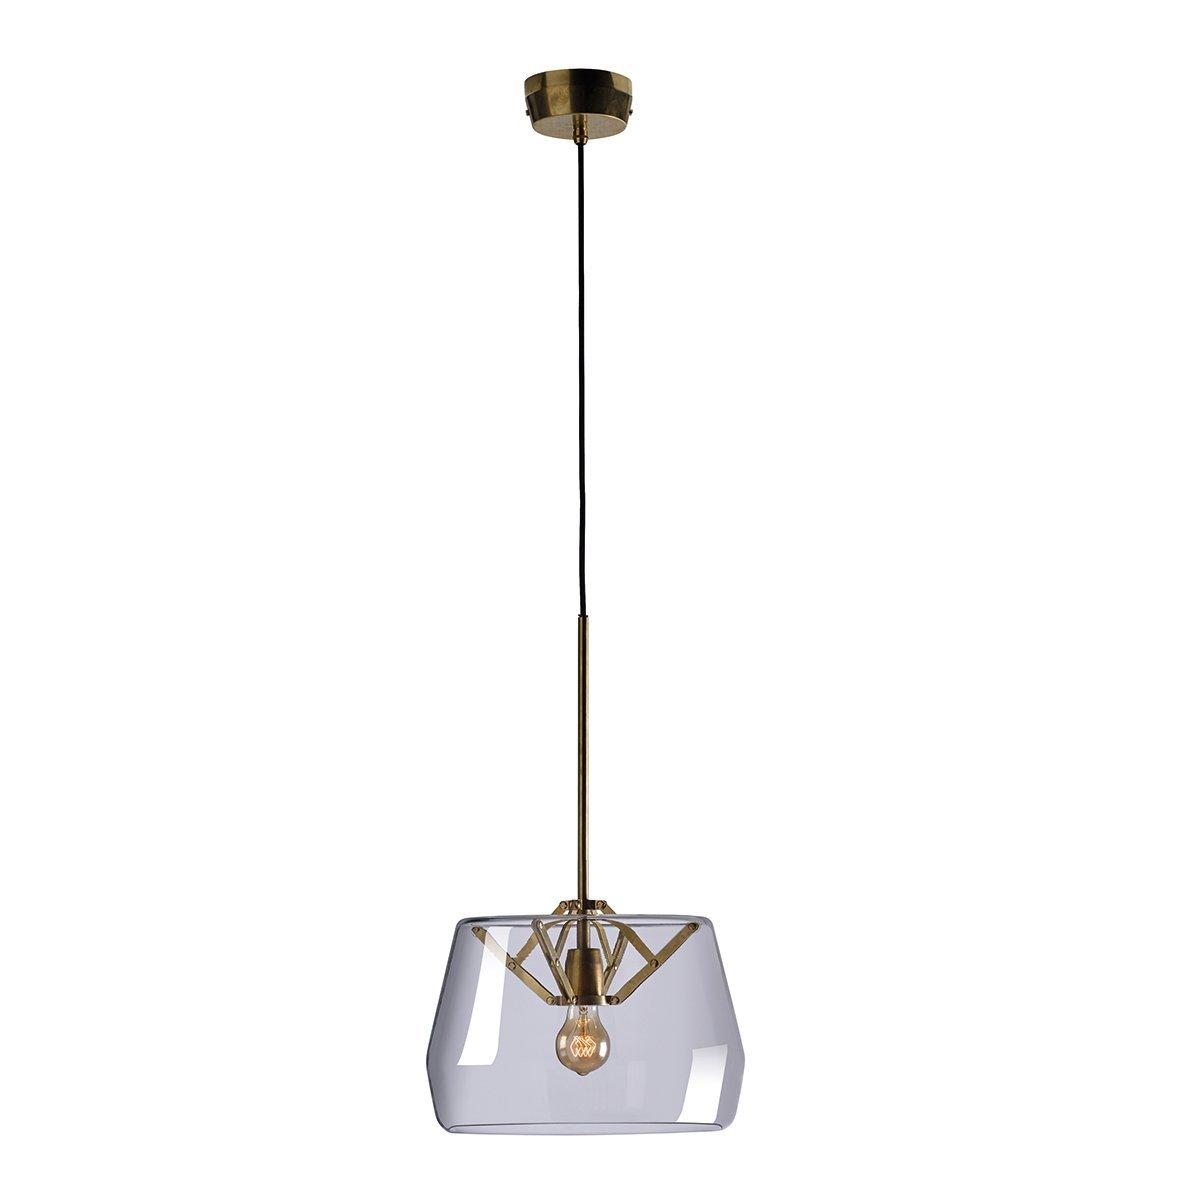 Tonone Atlas Hanglamp - Transparant �35 cm.